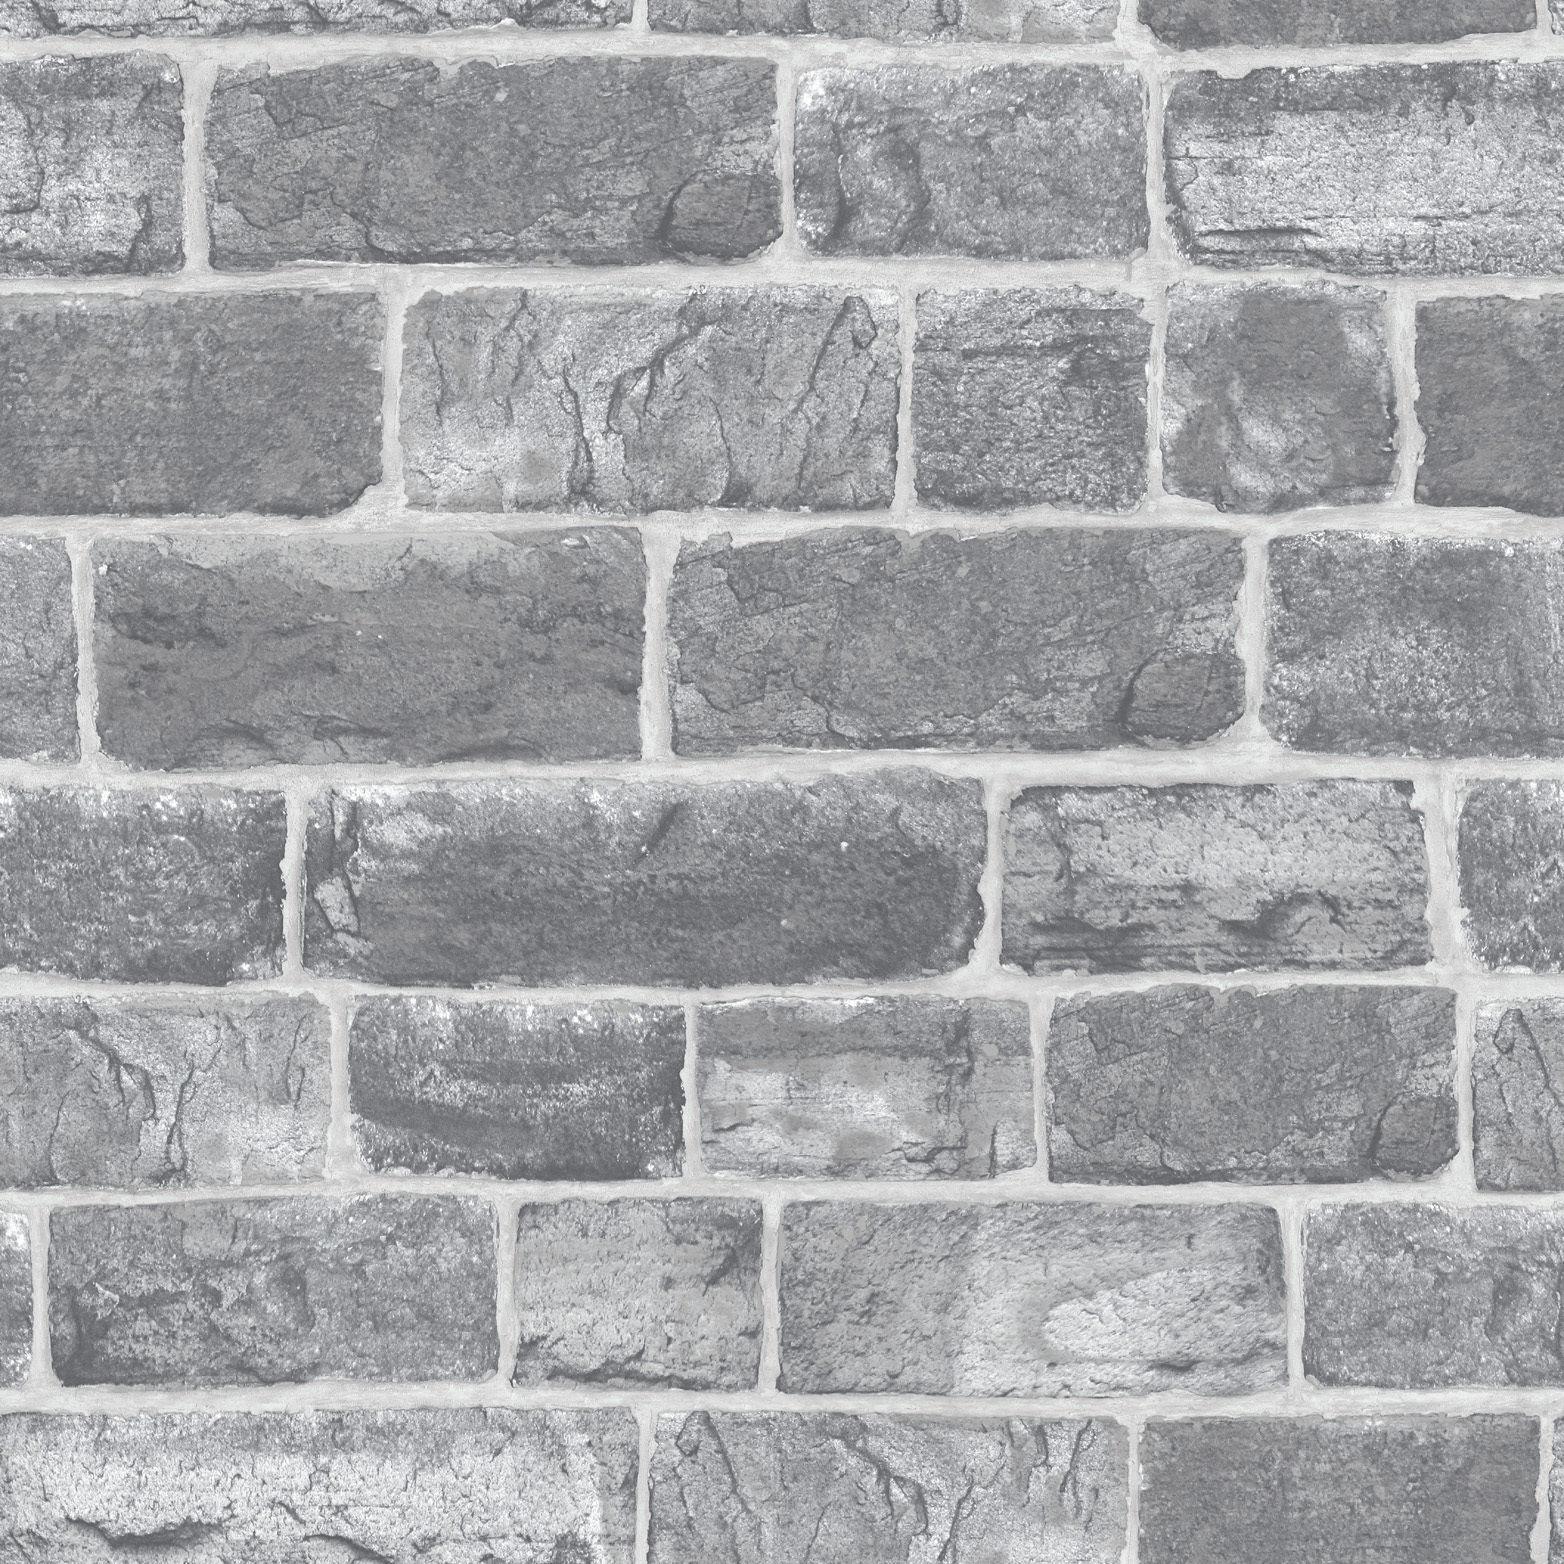 Luxe Papier peint Rasch Urbain Urbain Urbain Faux Brique/Gris Pierre Aspect Mur 217346 795026